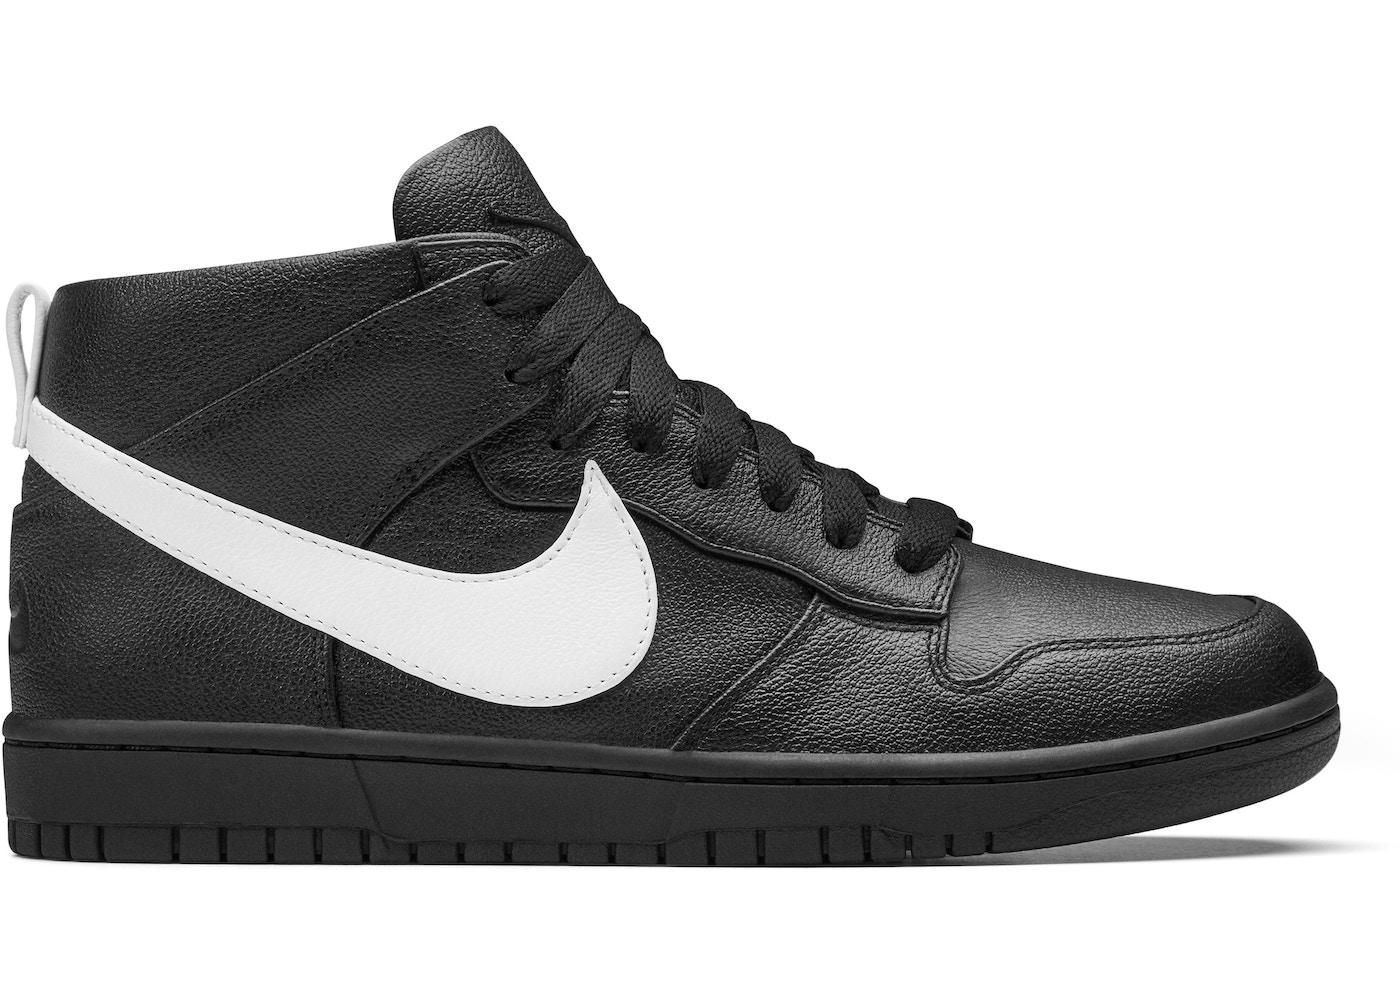 wholesale dealer 49fe8 933fa Nike Dunk Lux Chukka Riccardo Tisci Black - 910088-001